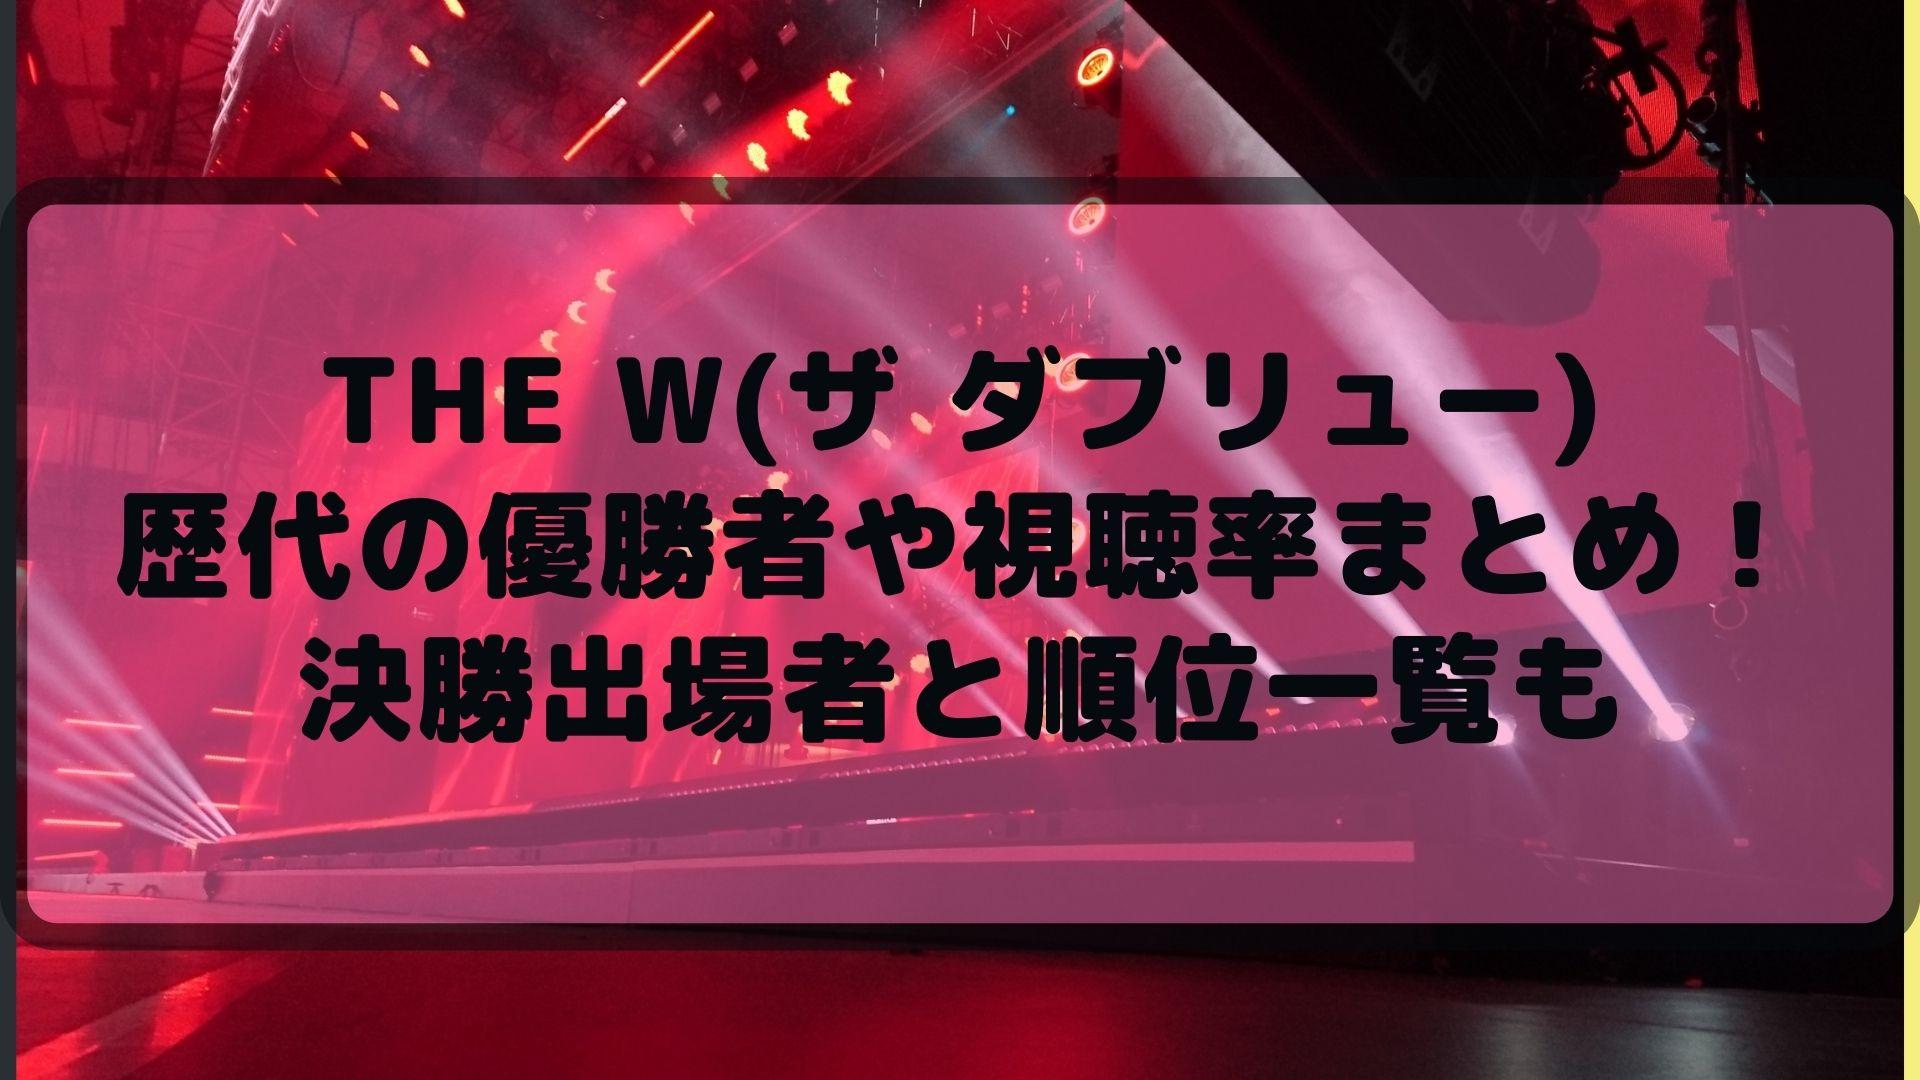 THE W(ザ ダブリュー)歴代の優勝者や視聴率まとめ!決勝出場者と順位一覧もタイトル画像